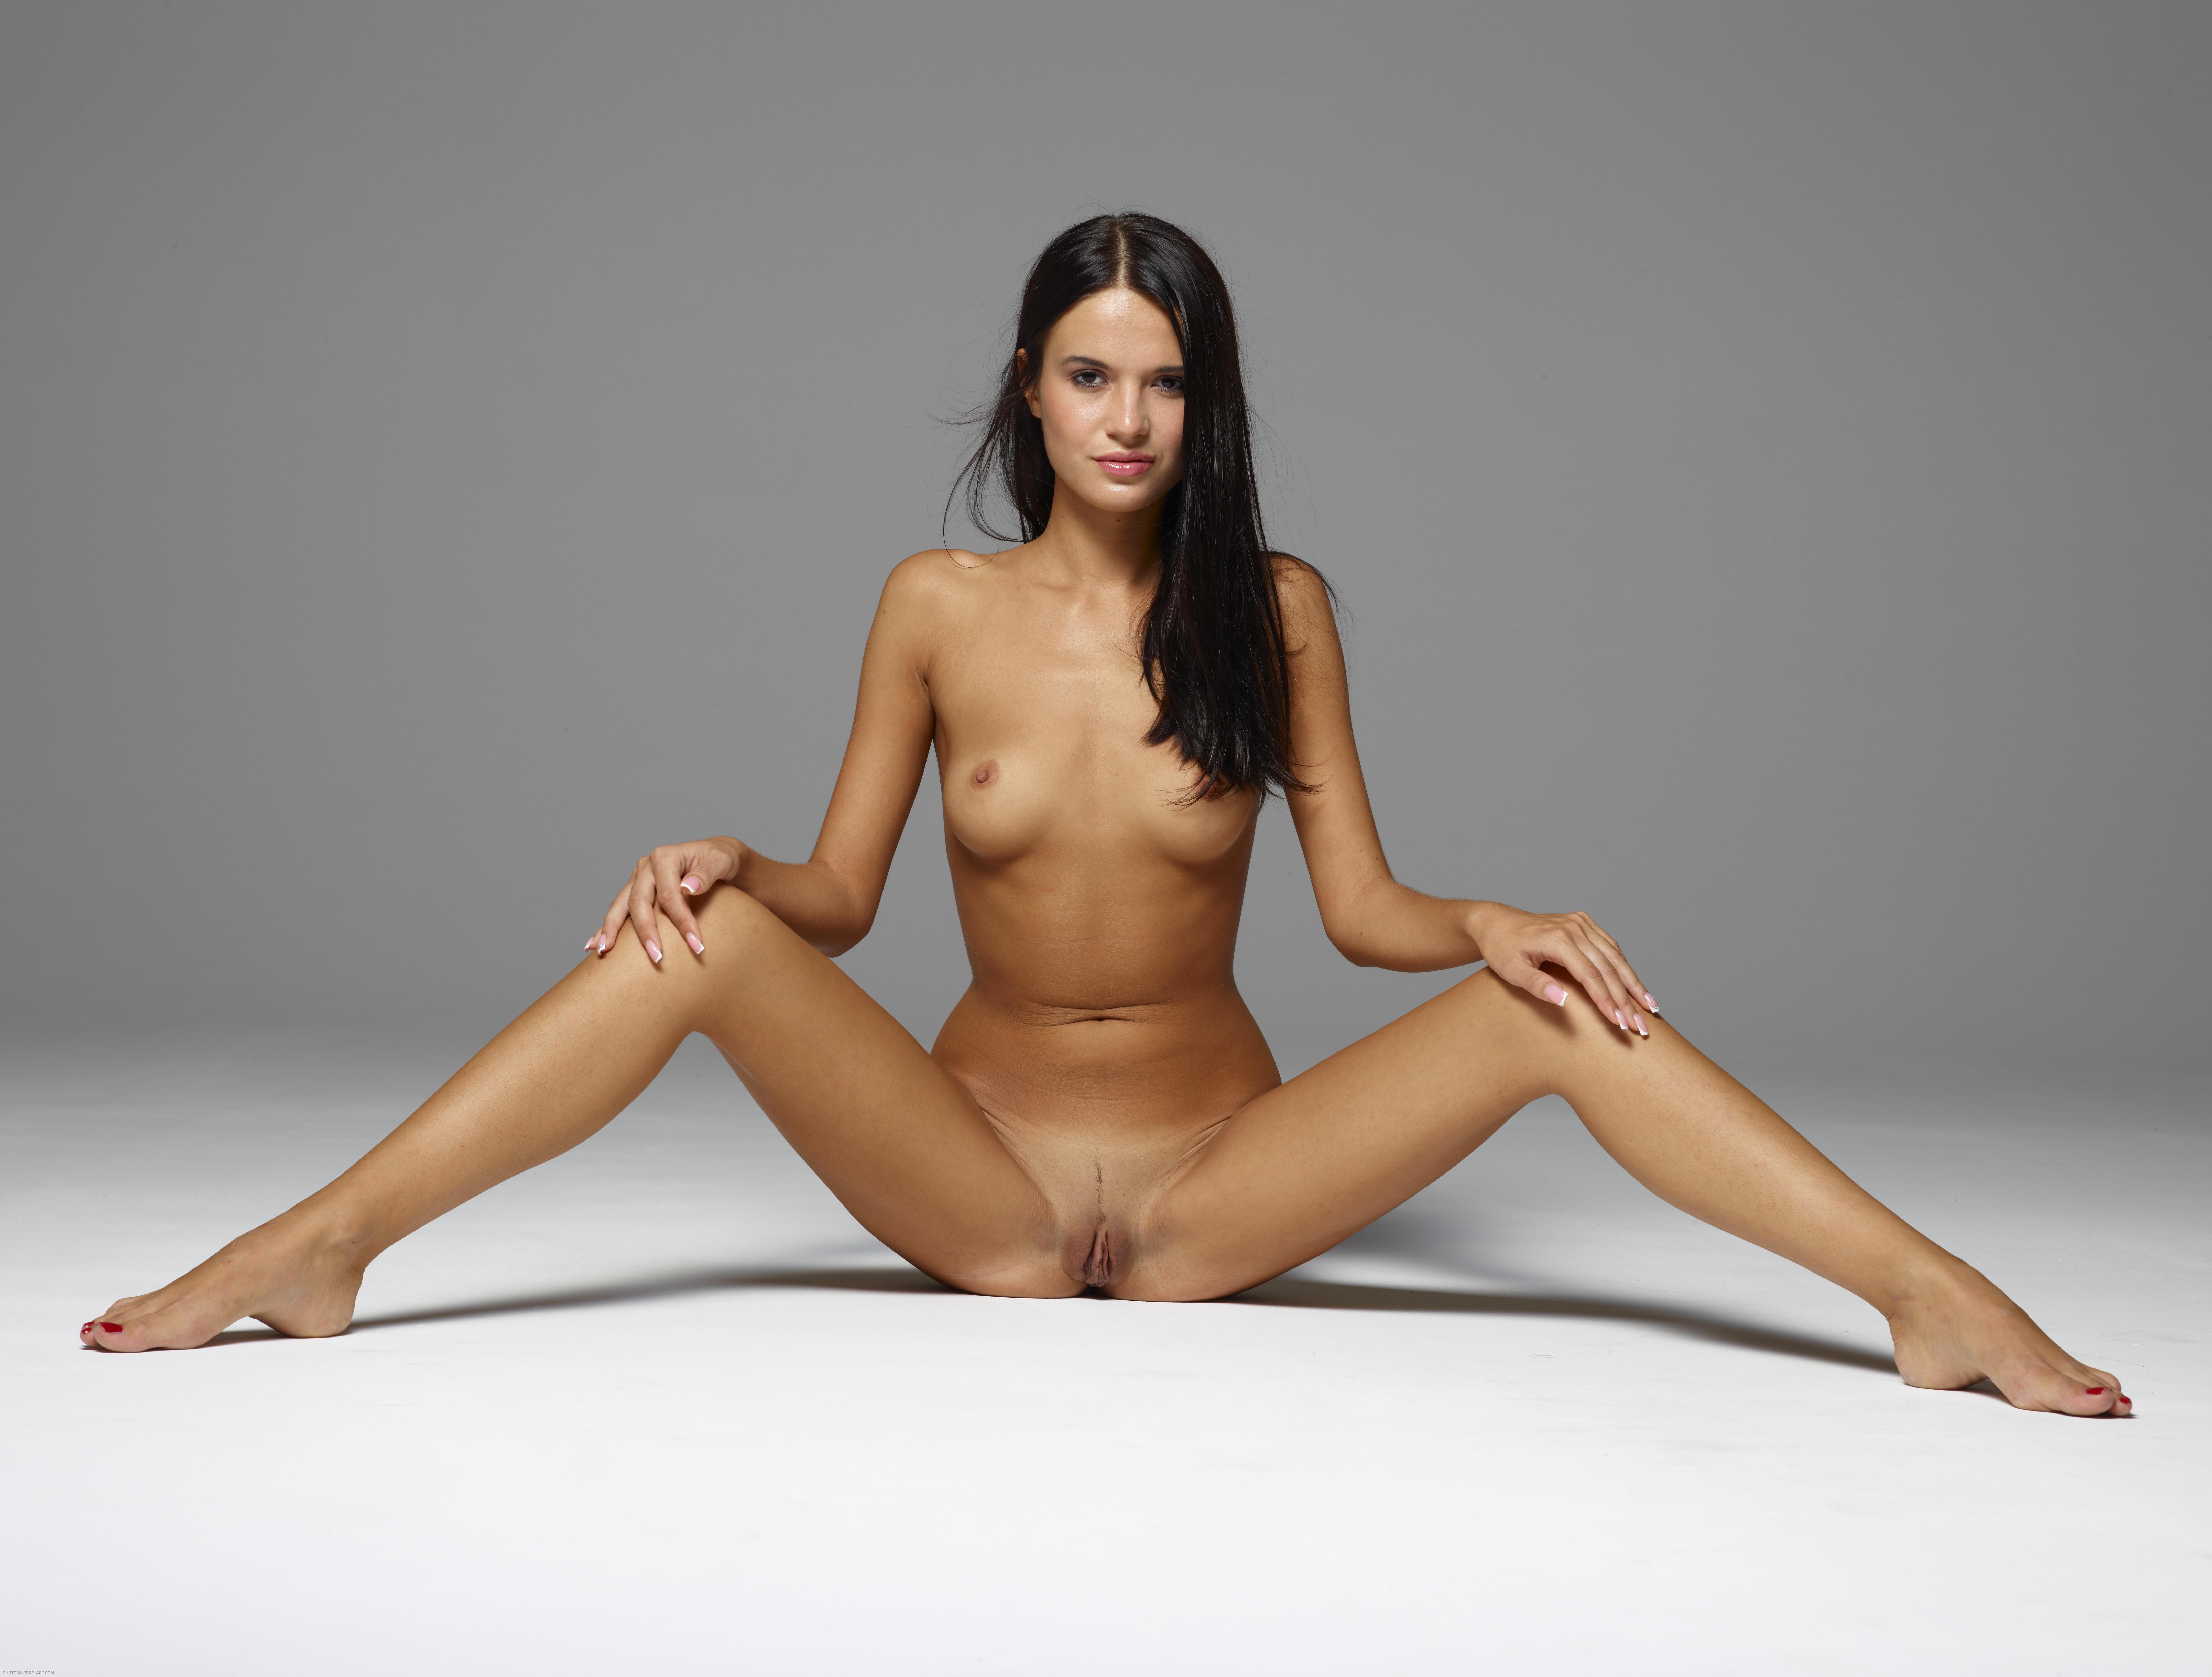 Naked girls from pieblo consider